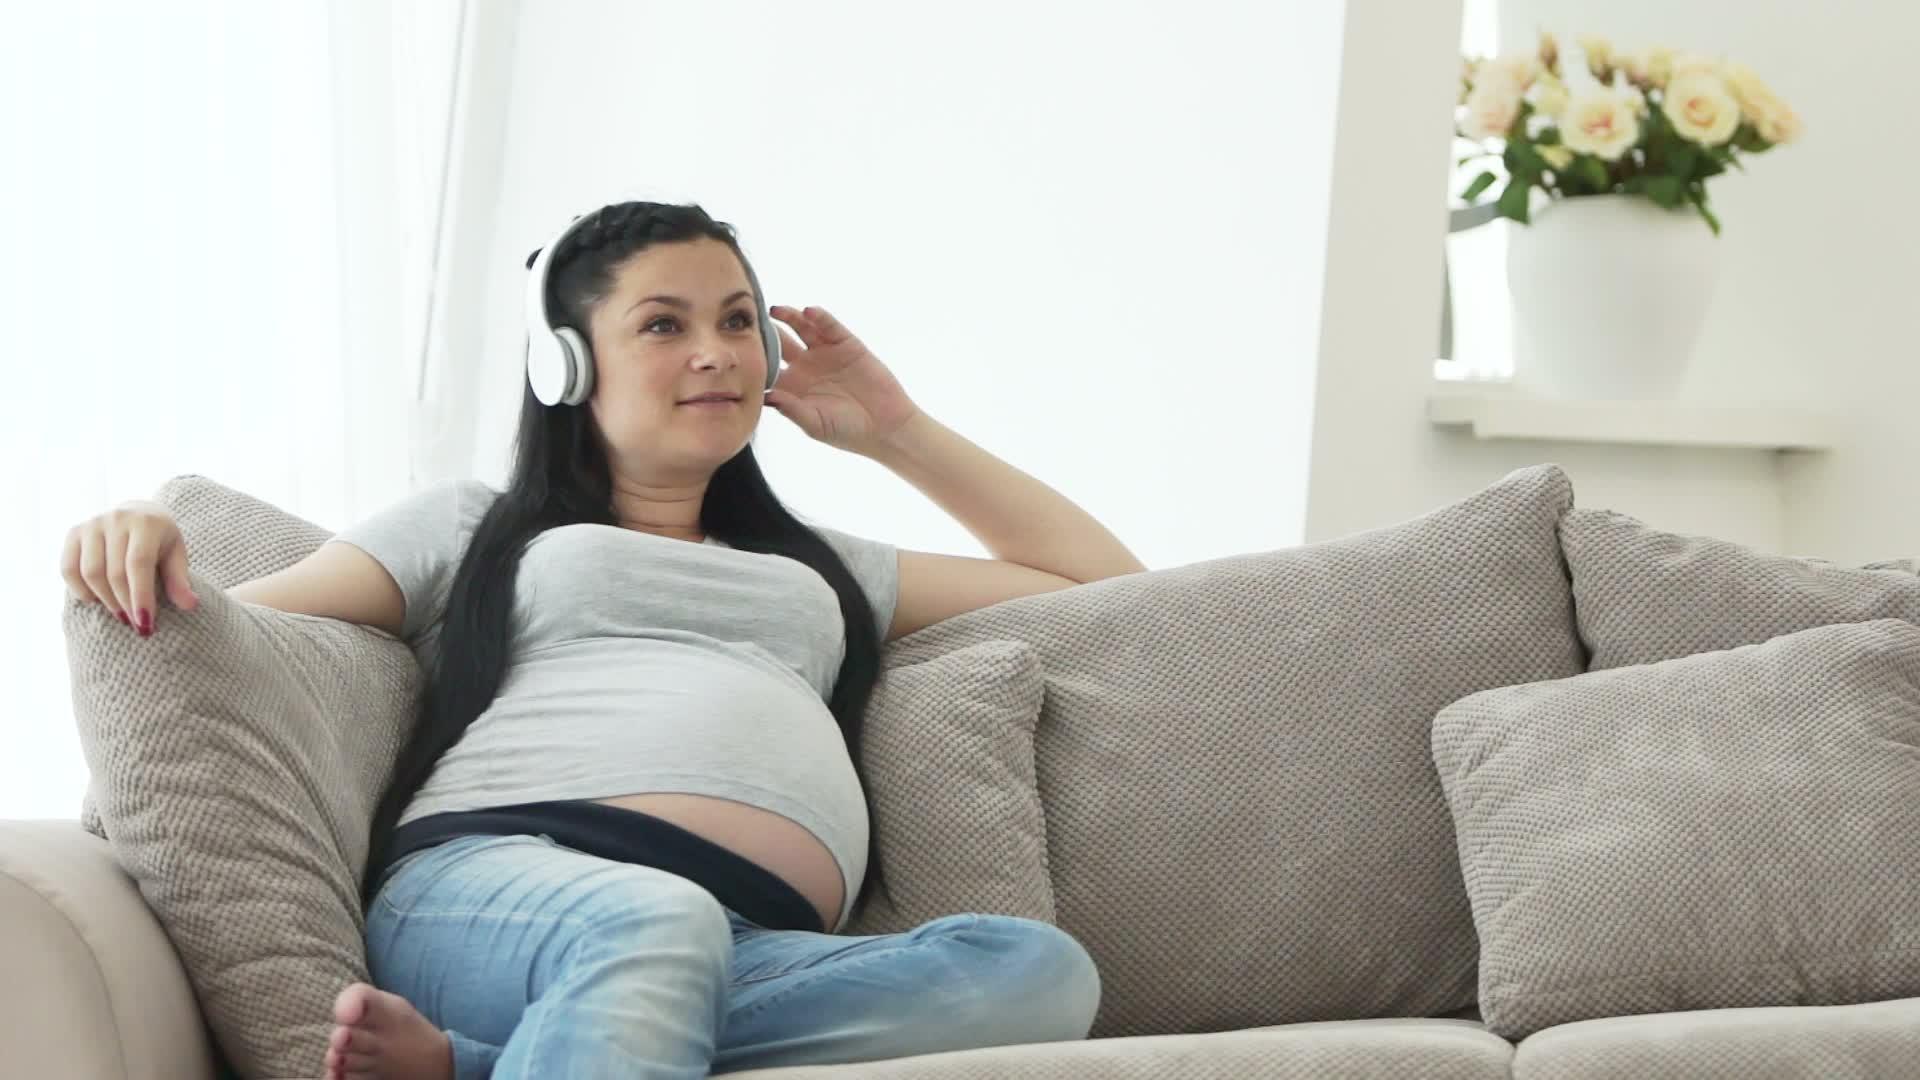 Ingin Menikmati Musik Selama Masa Hamil? Bagaimana Caranya?